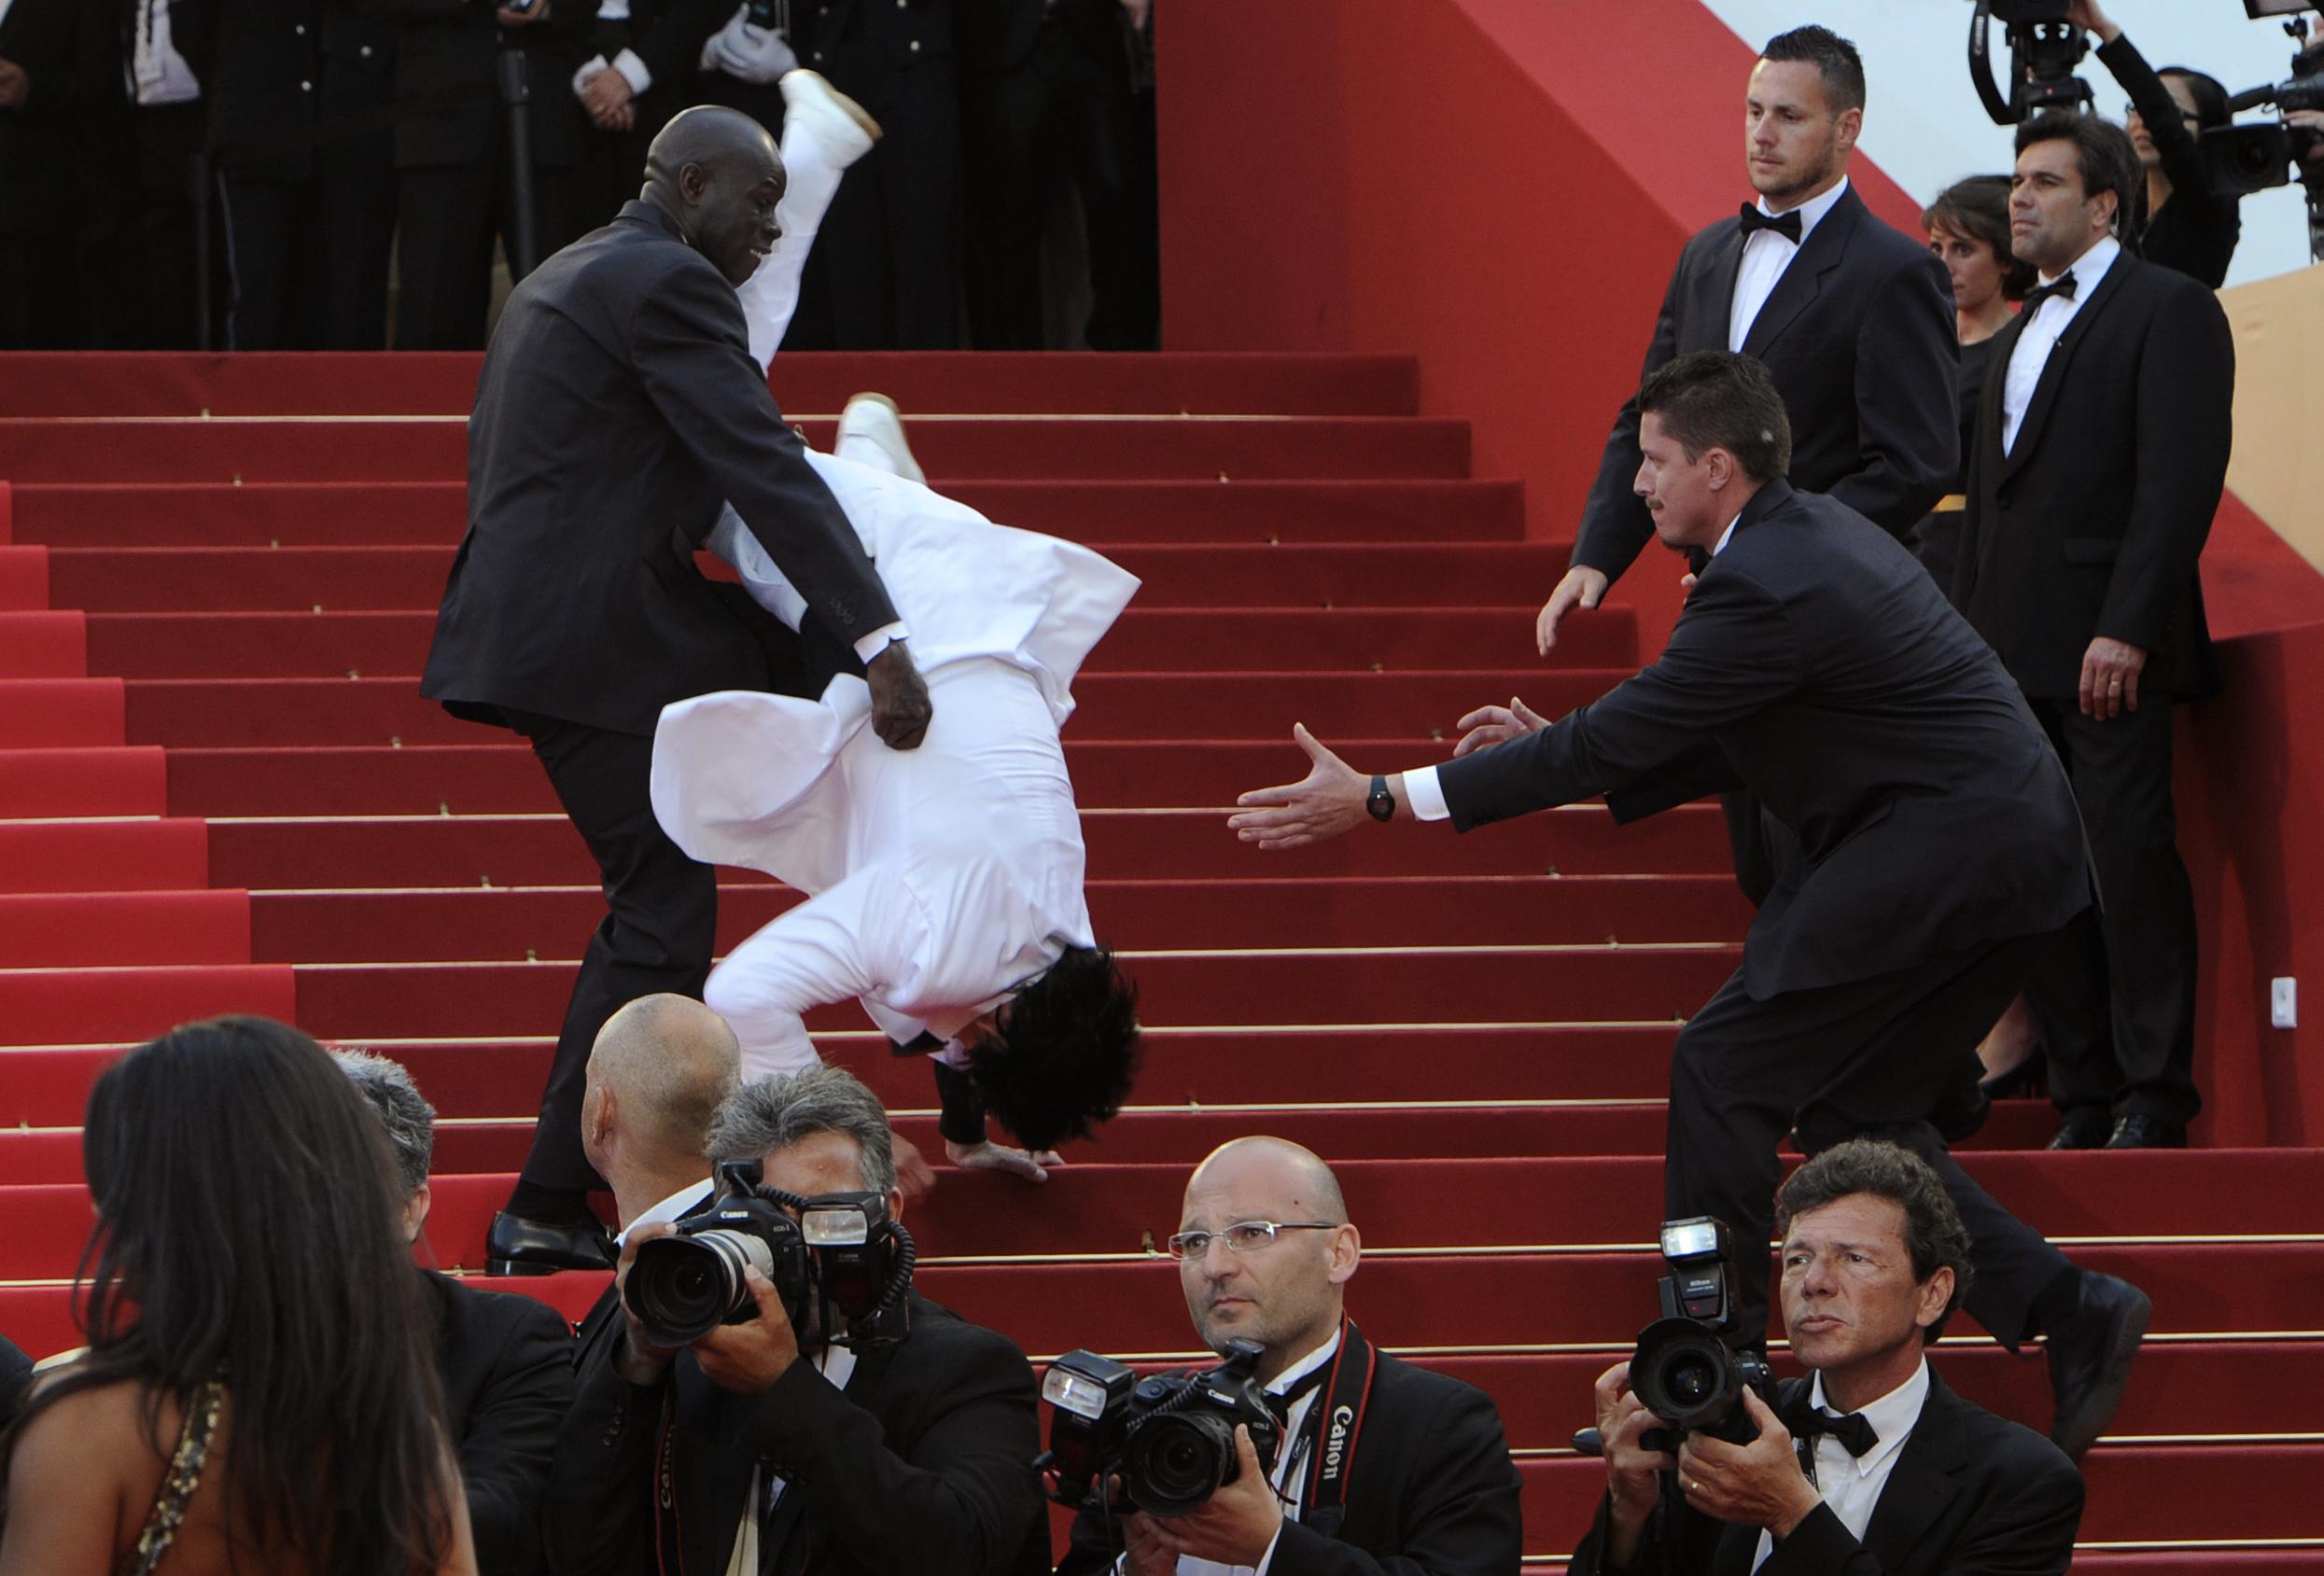 Did Jason Derulo Fall Down The Stairs? The Origins Of the Hilarious Met Gala Meme - Newsweek